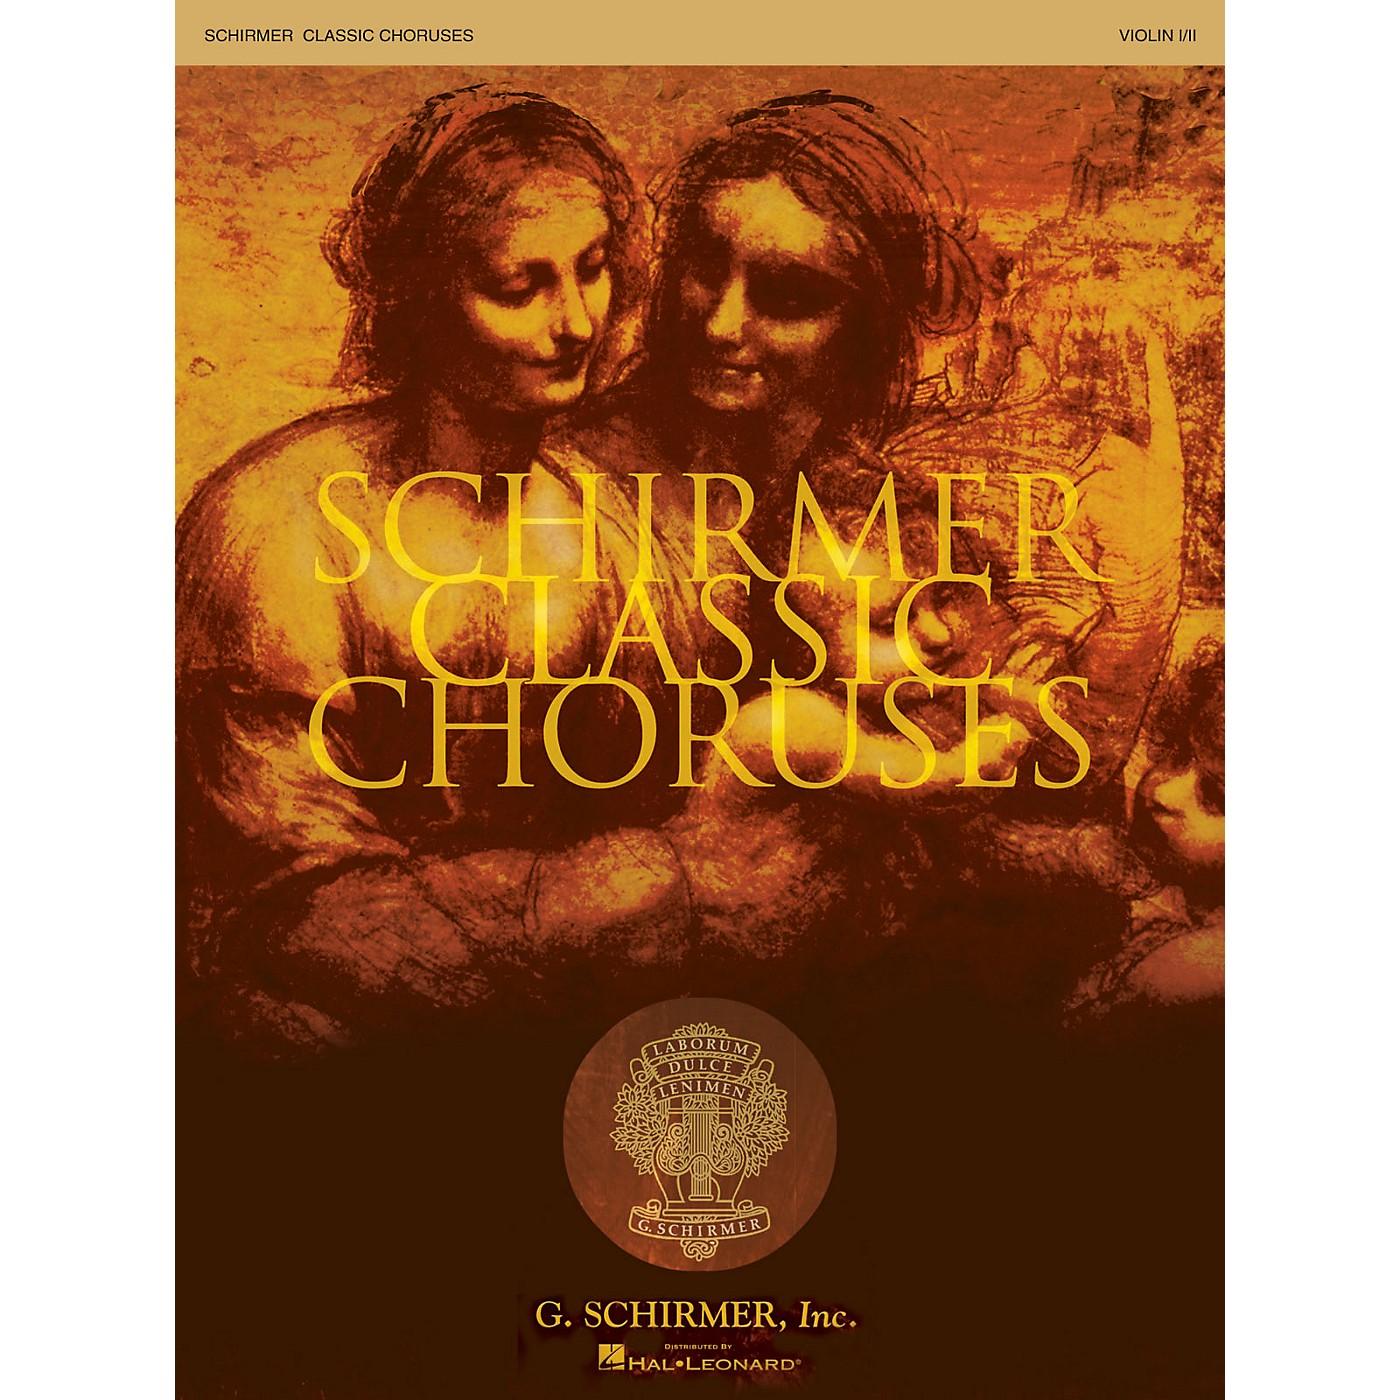 G. Schirmer Schirmer Classic Choruses (Violin I/II) arranged by Stan Pethel thumbnail